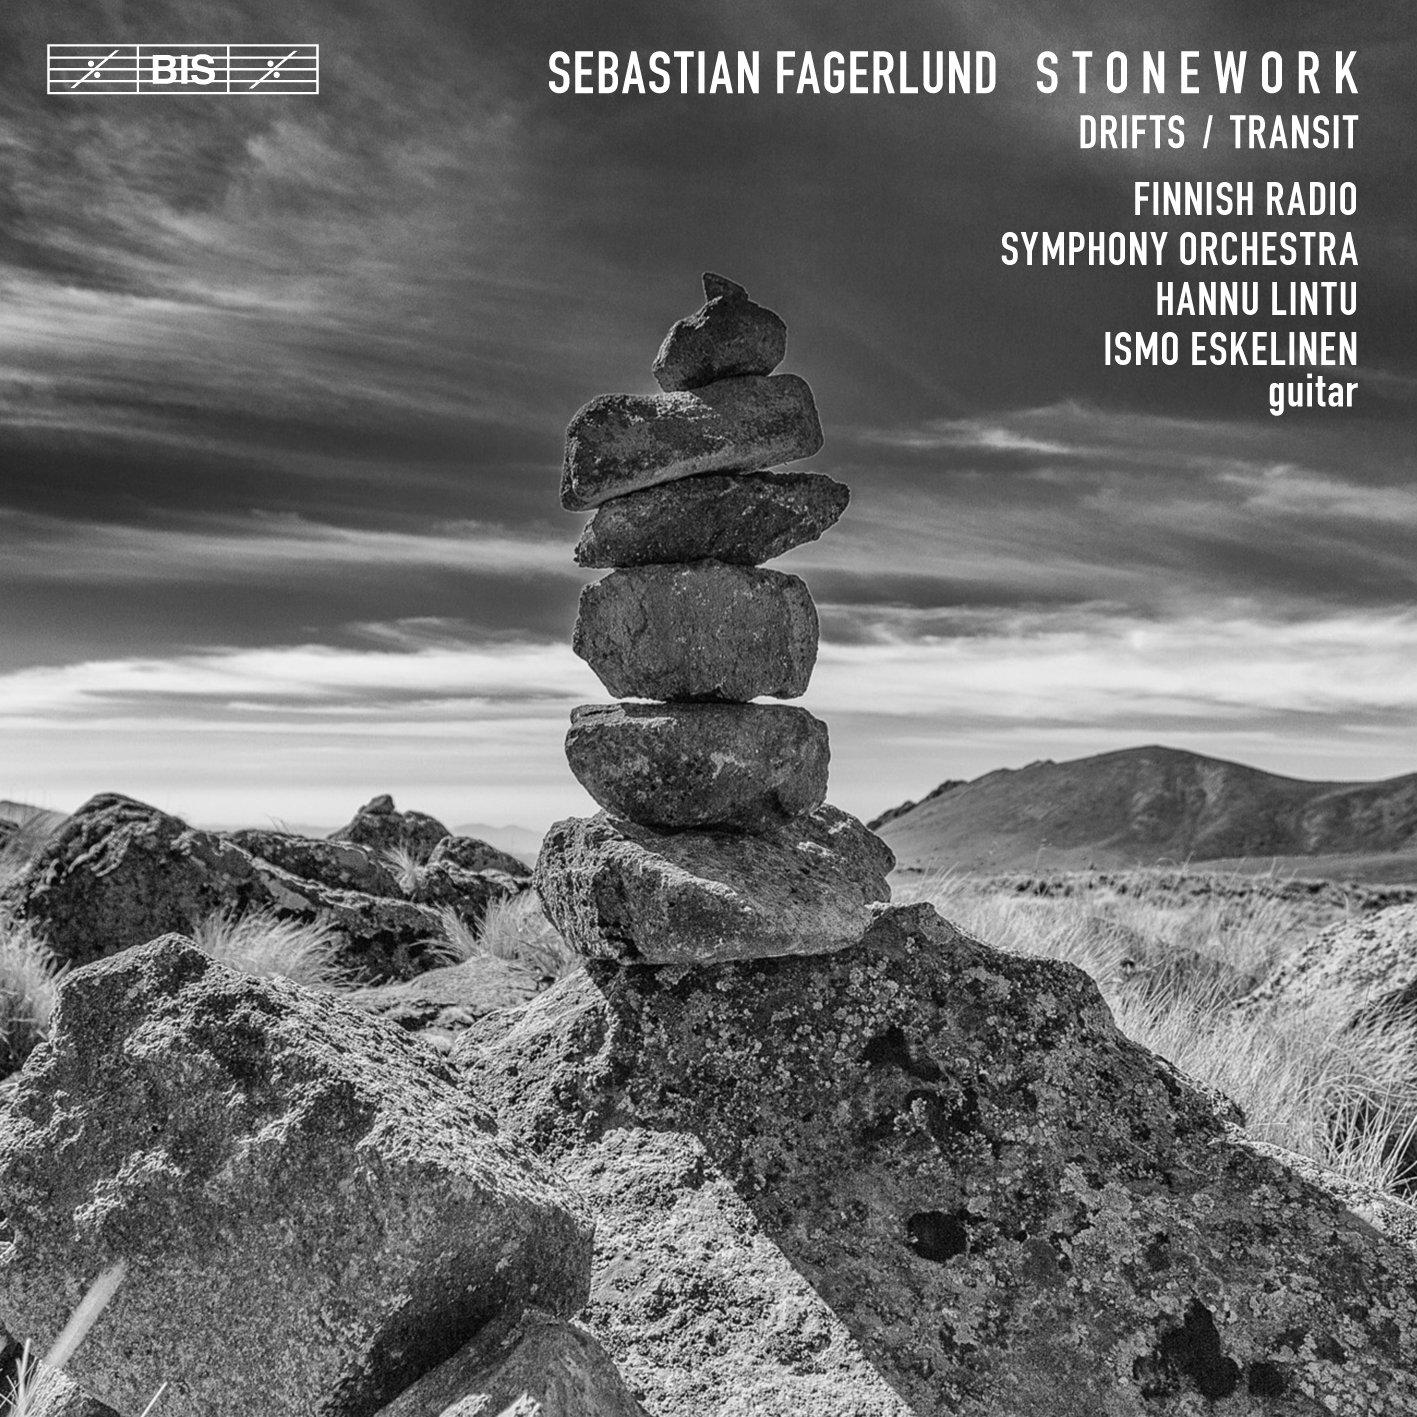 SACD : Finnish Radio Symphony Orchestra - Ismo Eskelinen - Stonework (Hybrid SACD)